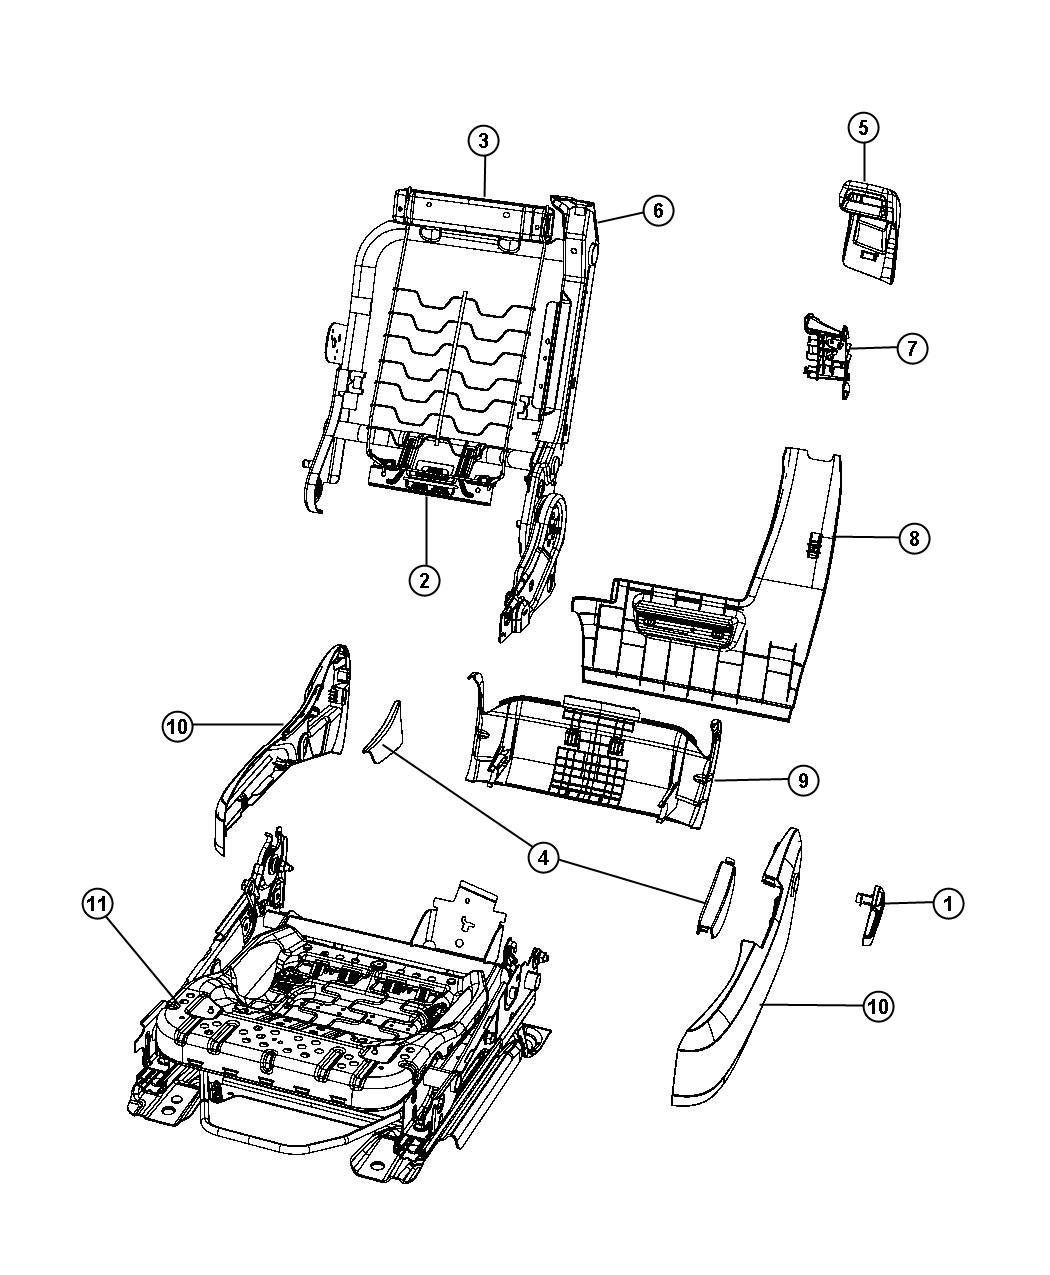 Chrysler Sebring Shield. Seat cushion. Inboard. [j1]. Trim